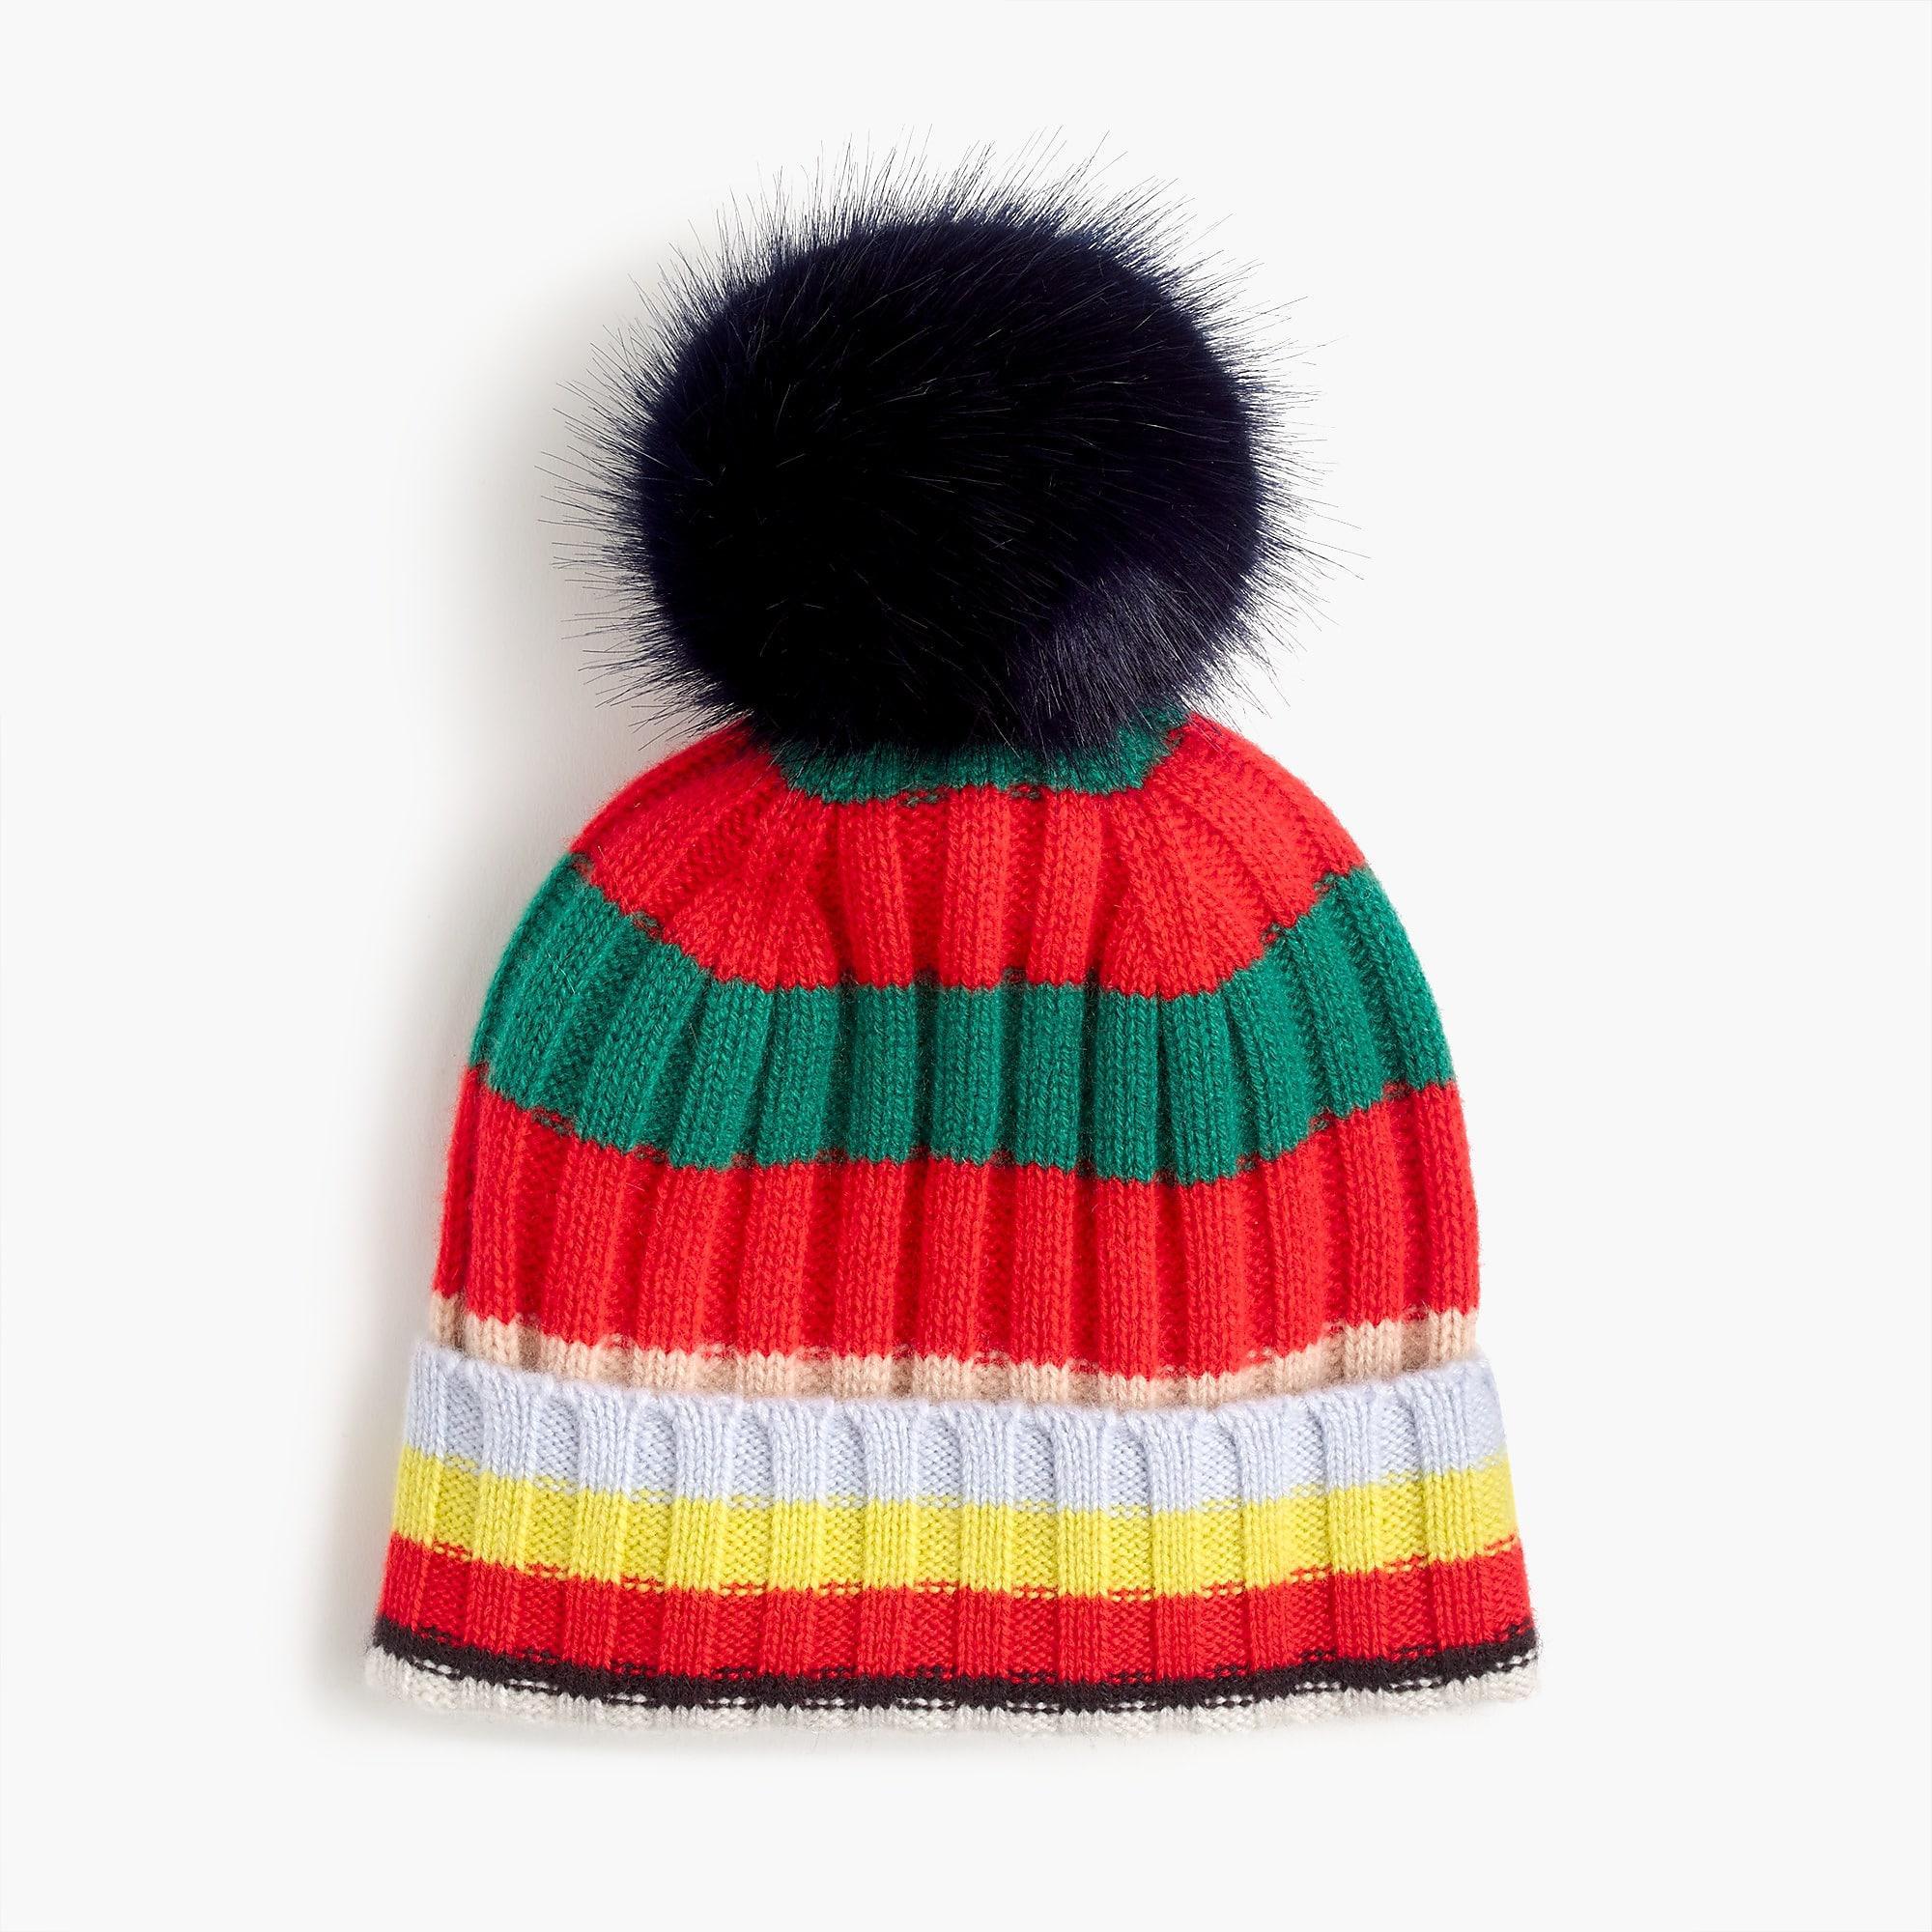 68a0ec85ef0 ... Blue Pom Pom Hat In Striped Everyday Cashmere - Lyst. View fullscreen